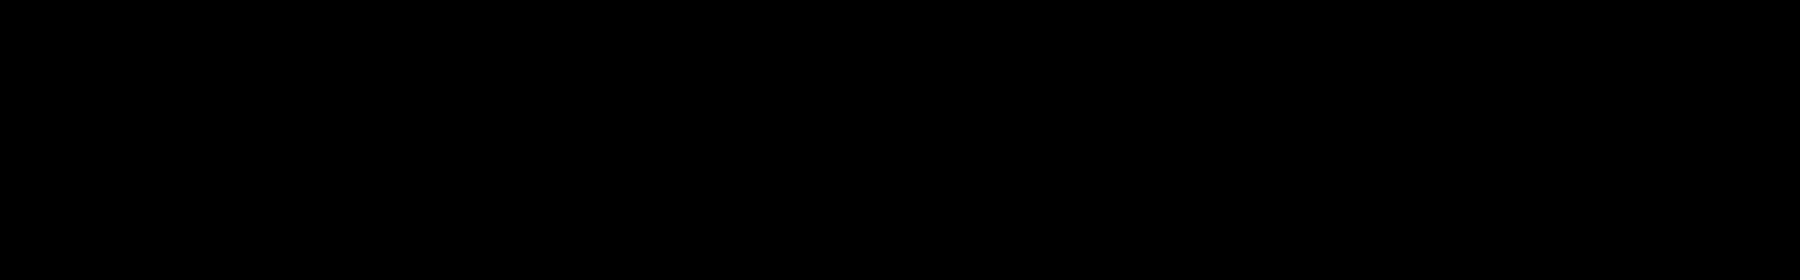 Glitch audio waveform